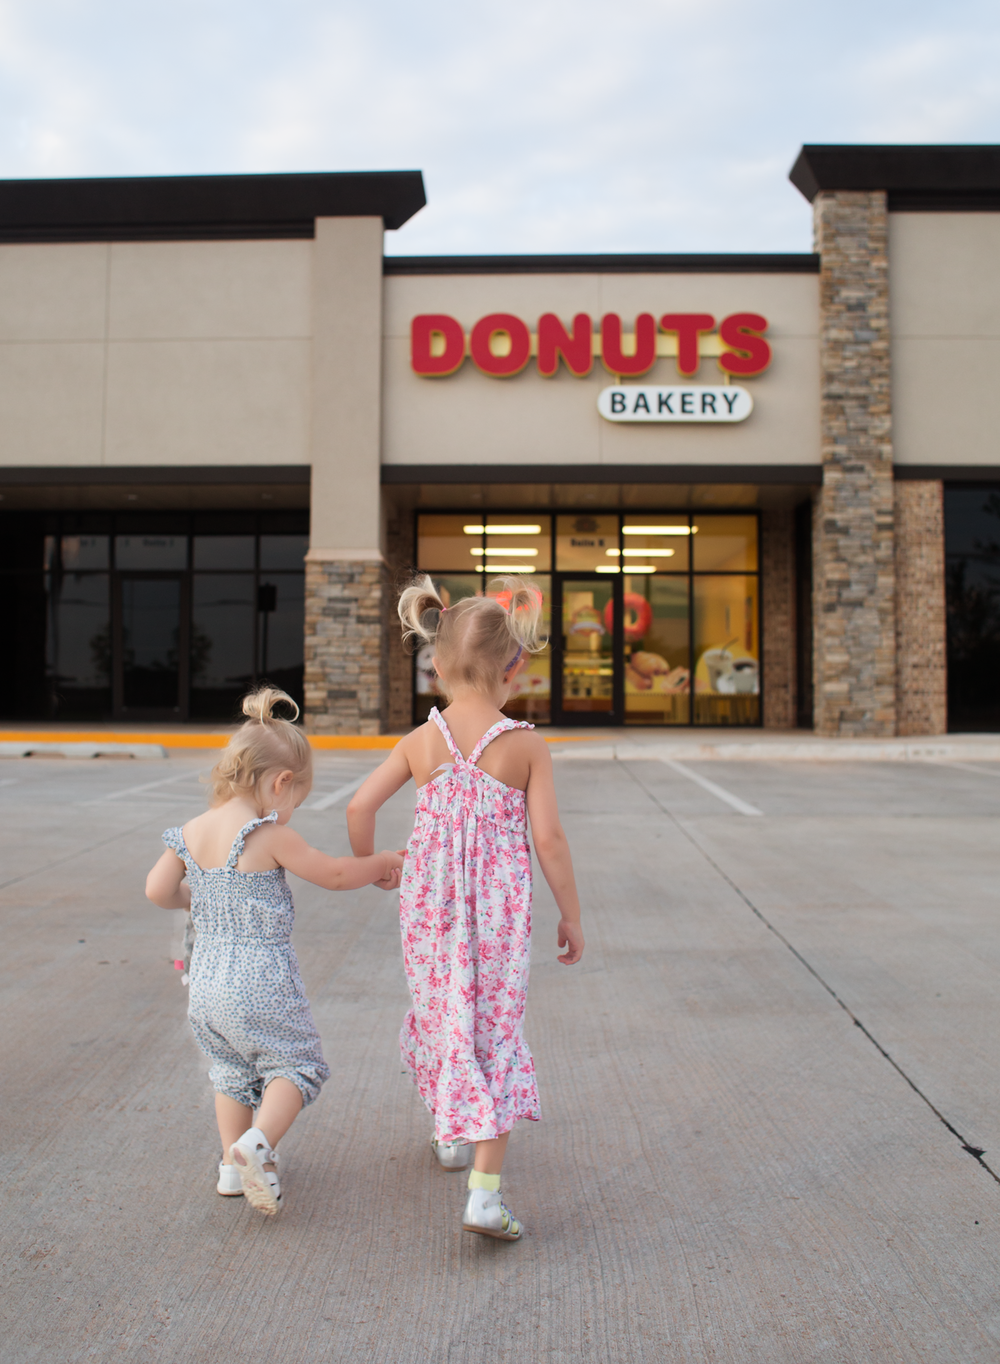 05 donut date sisters doughnut shop edmond ok photographer oklahoma city (2).png